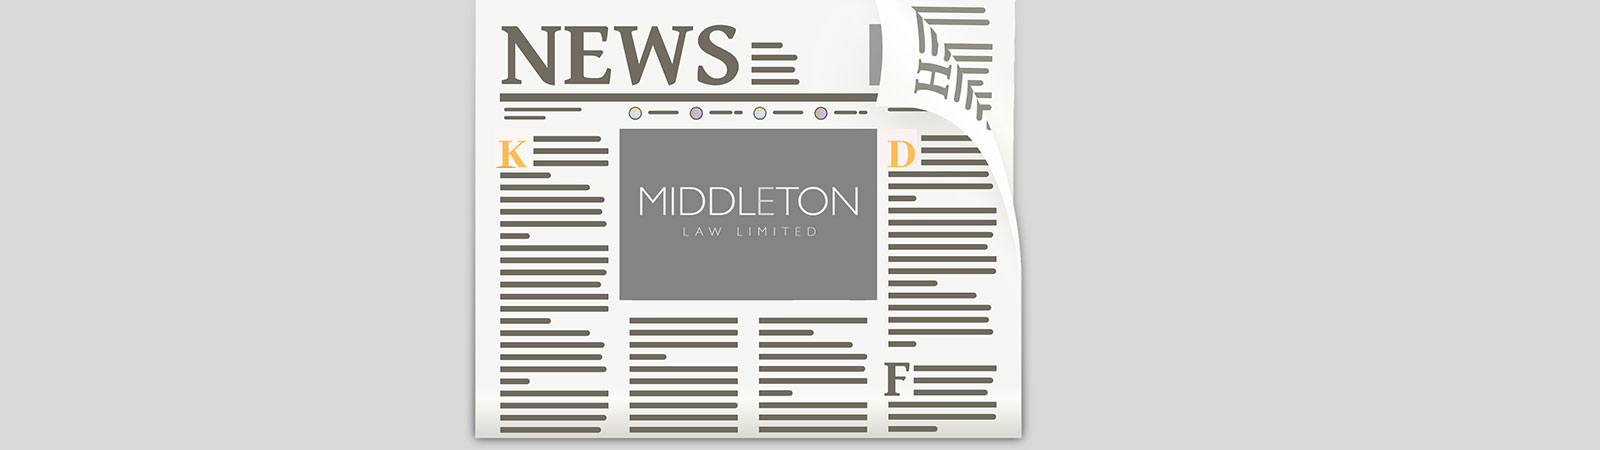 Newspaper image for Middleton Law